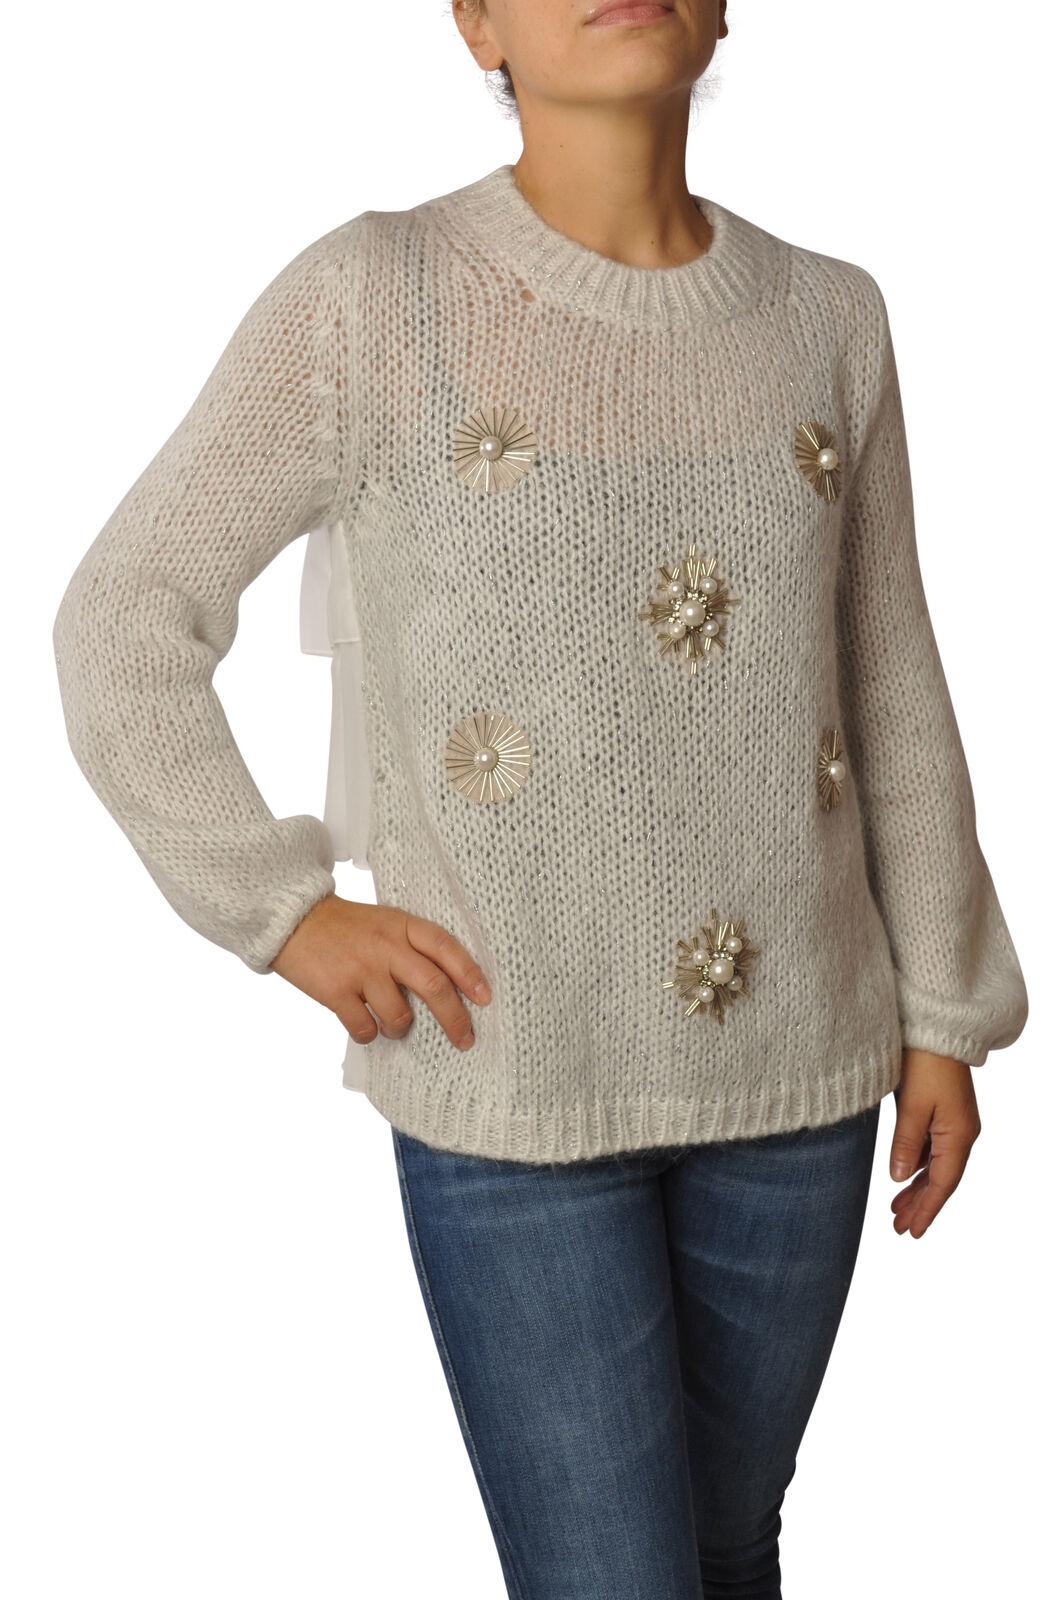 Ki 6 - Knitwear-Sweaters - Woman - Weiß - 5640809C191732